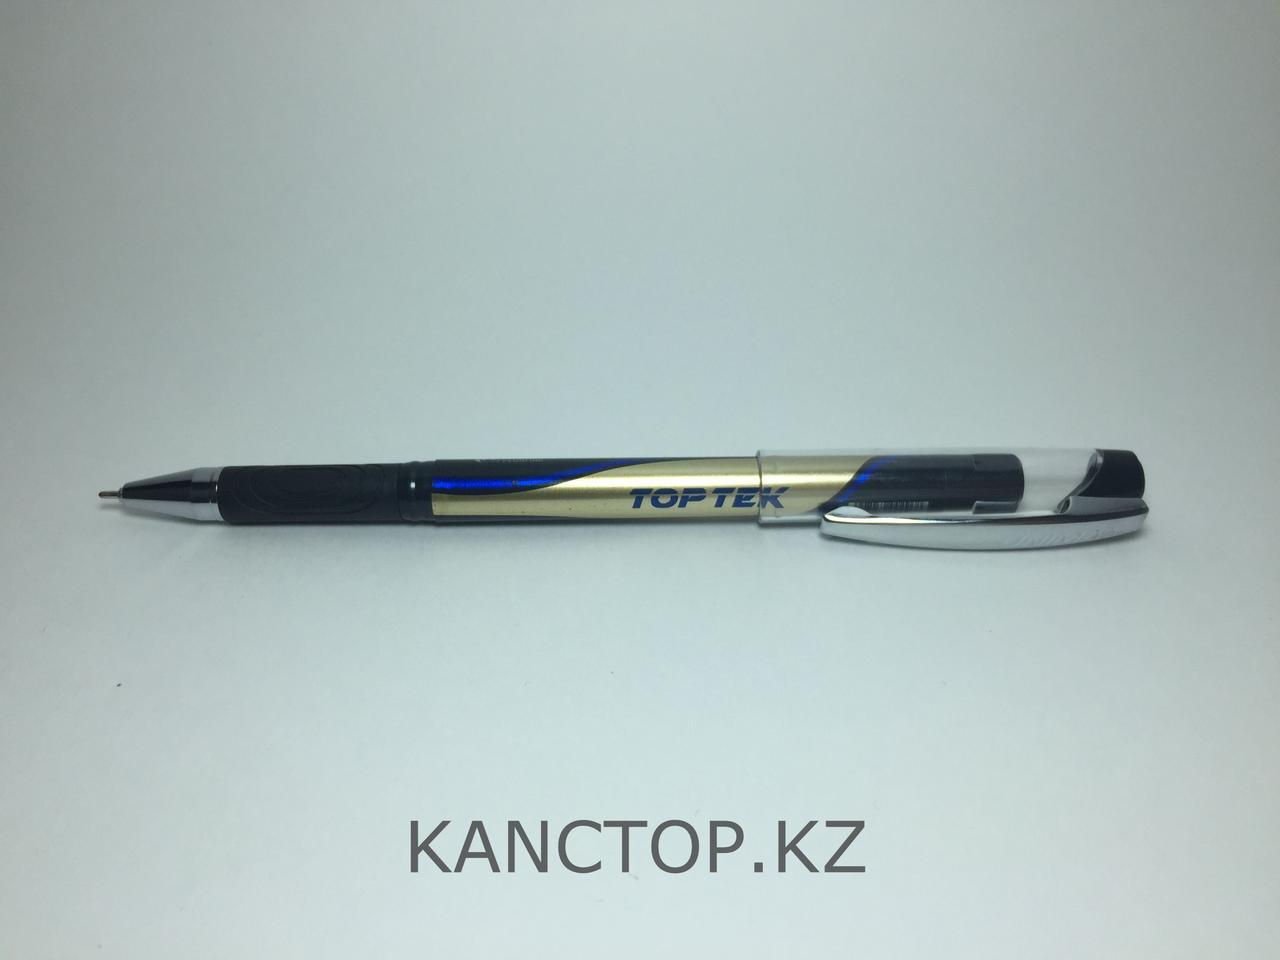 Ручка шариковая UNI-MAX TOP TEK ST Синяя